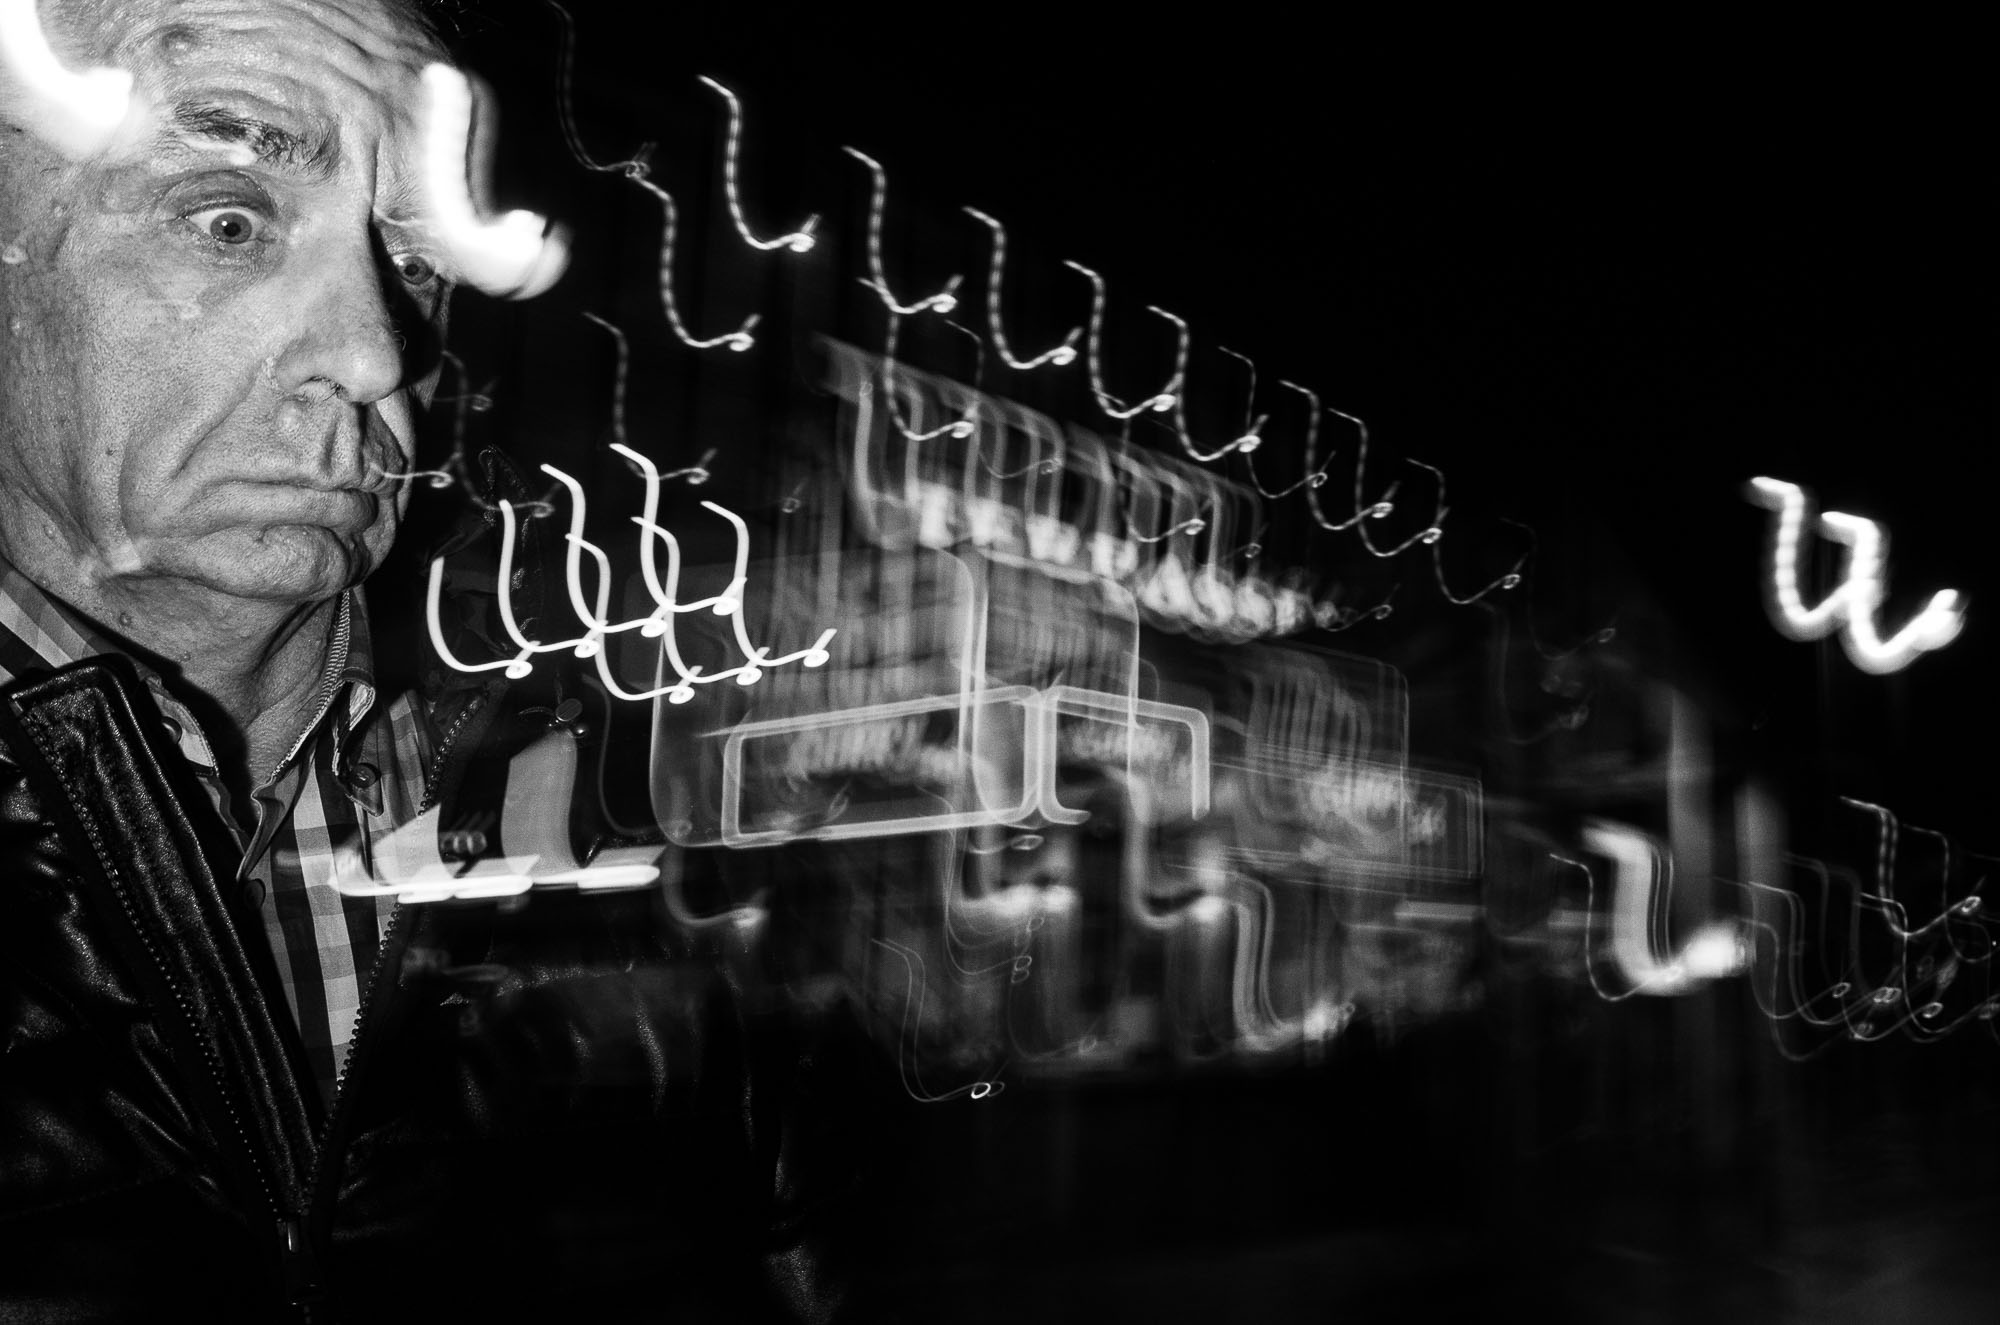 Berlin Noir • Street Photography Berlin in Black and White